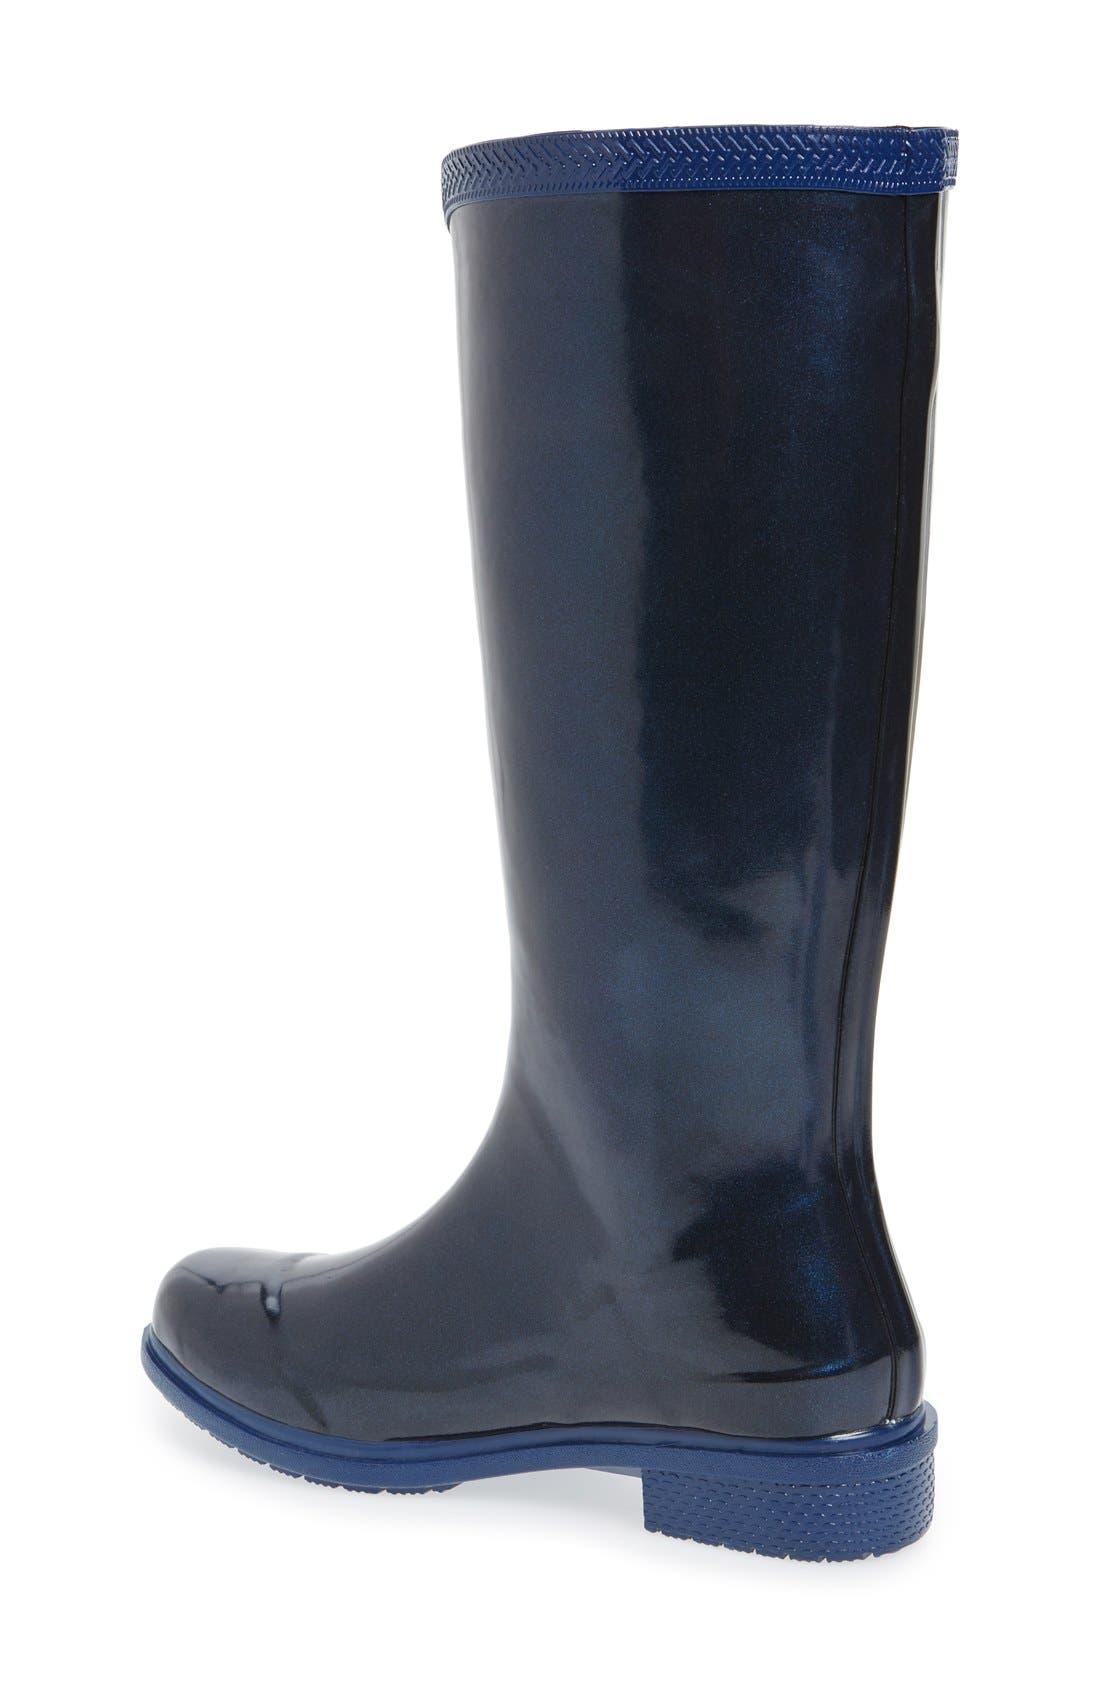 'Galochas Hi Metallic' Waterproof Rain Boot,                             Alternate thumbnail 2, color,                             Navy Blue Metallic